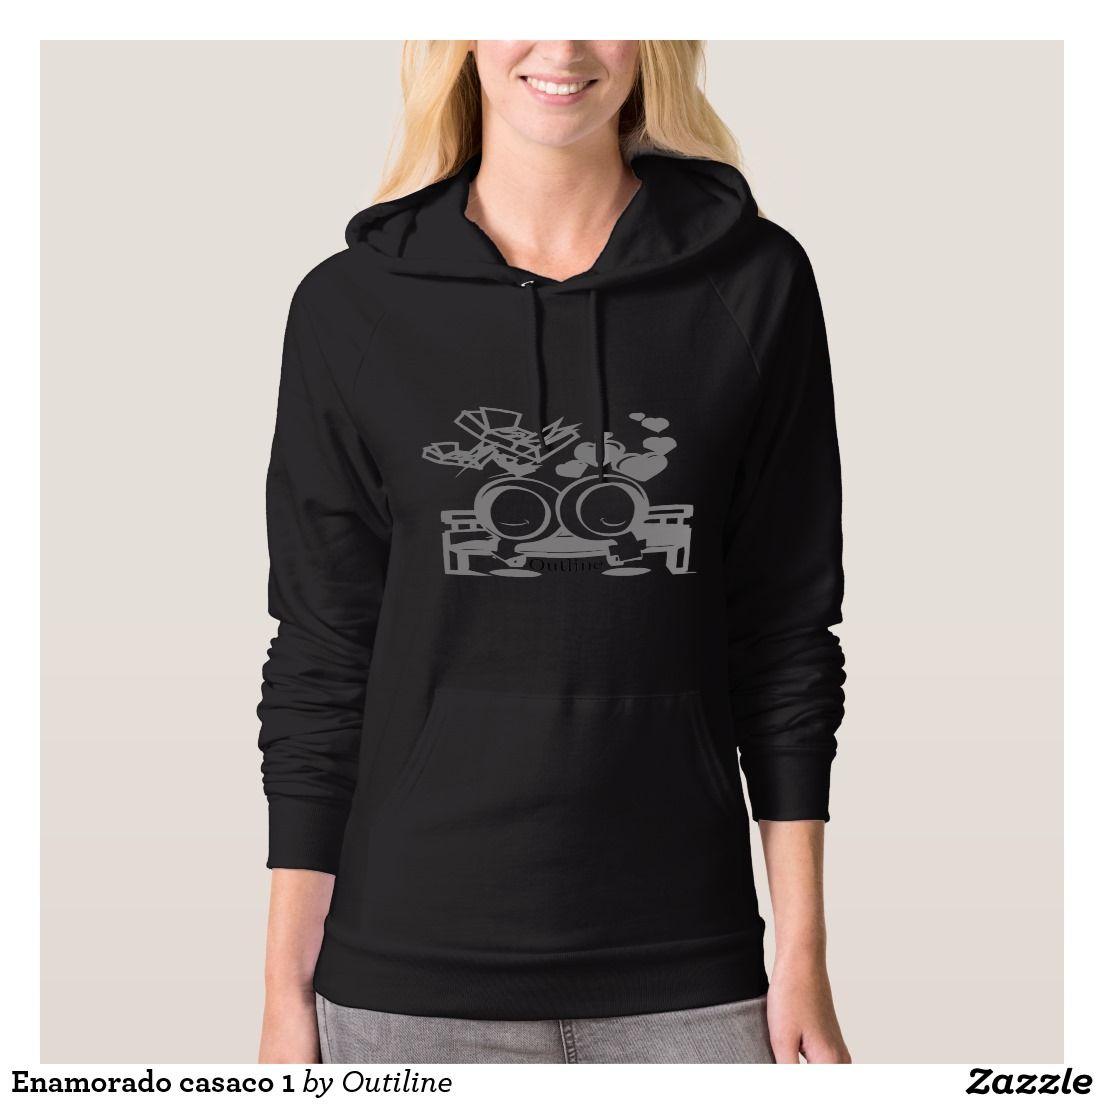 b503f8ba0 Moletom Enamorado casaco 1   Zazzle.com.br   Outiline Camisetas ...